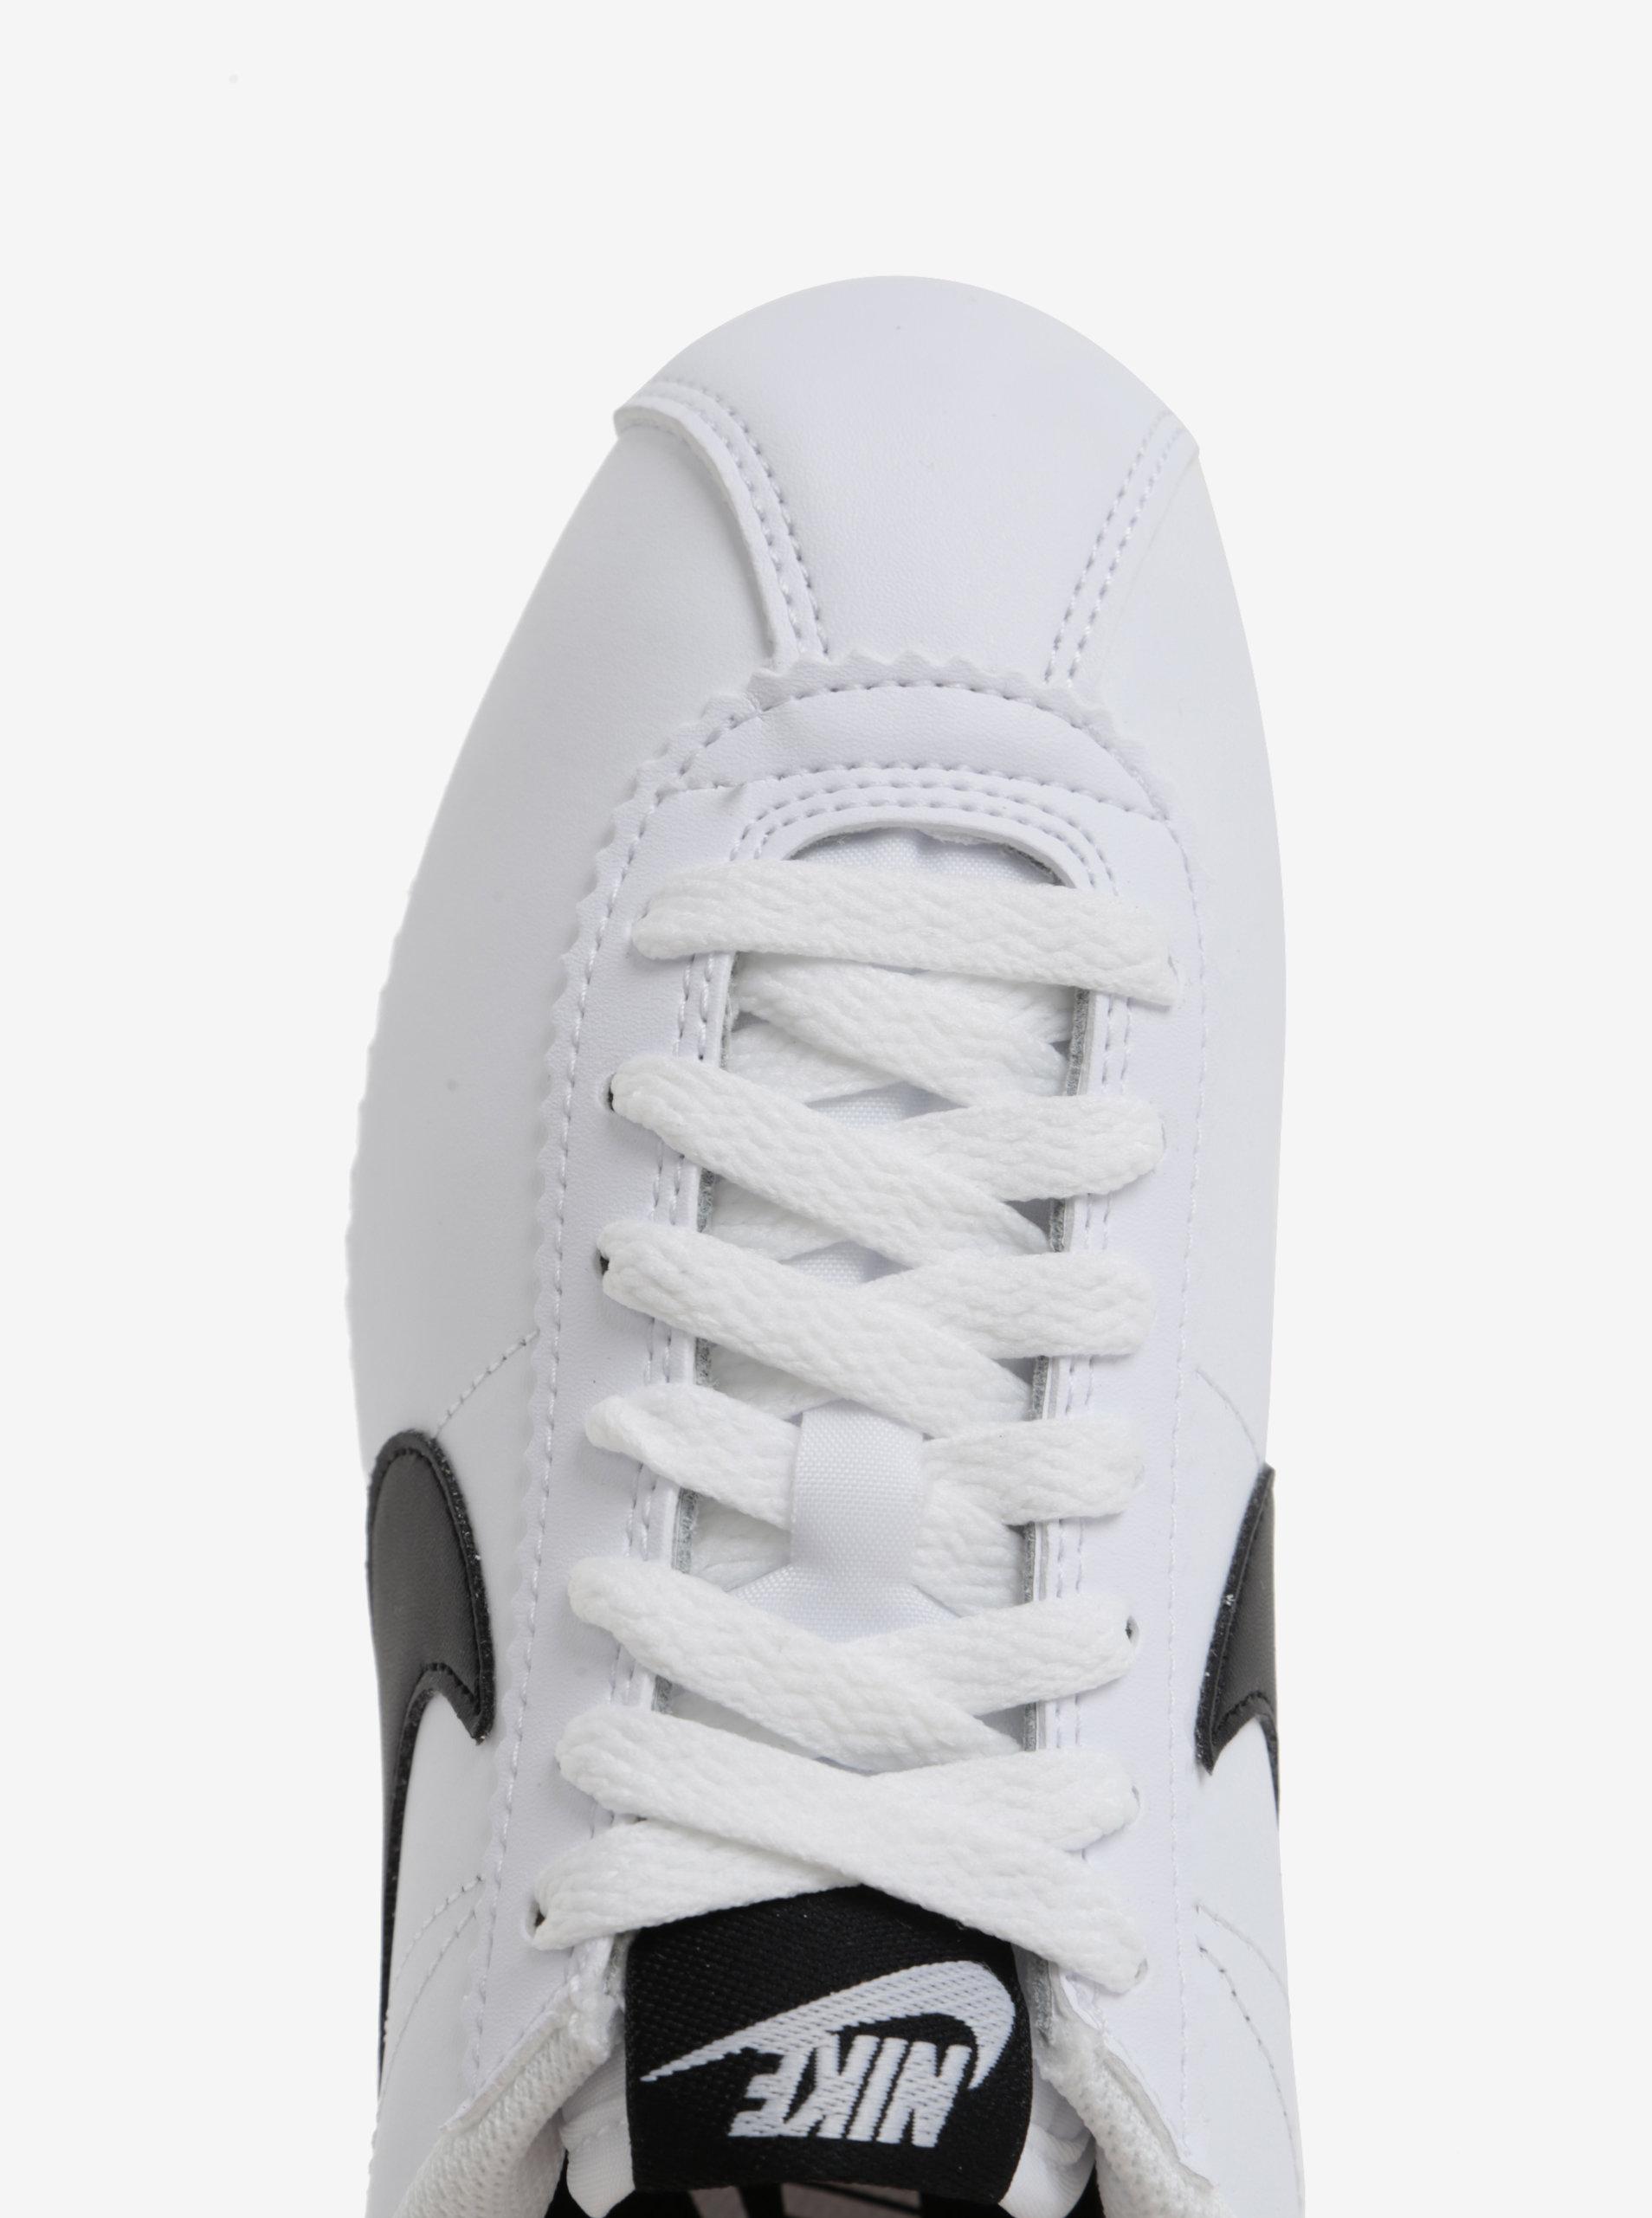 a5dac92ee3c19 Čierno-biele dámske tenisky Nike Classic Cortez | ZOOT.sk